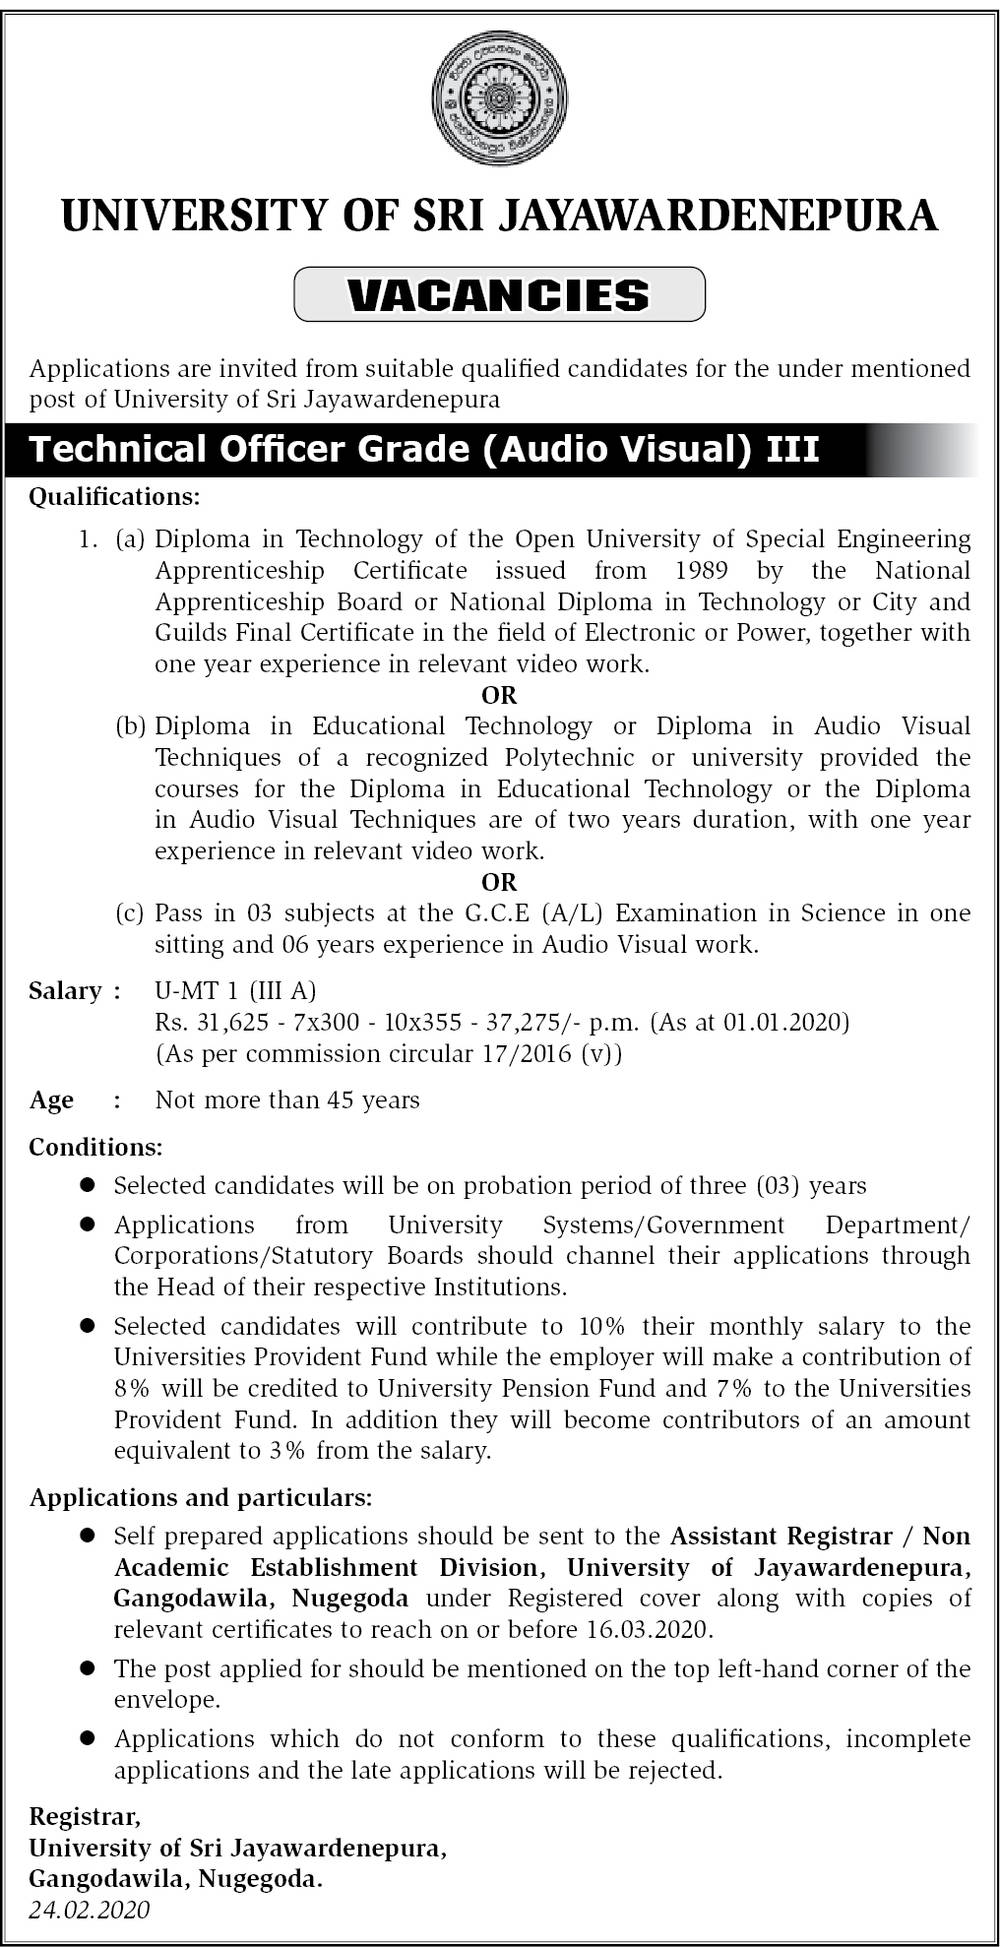 Technical Officer (Audio Visual) - University of Sri Jayewardenepura